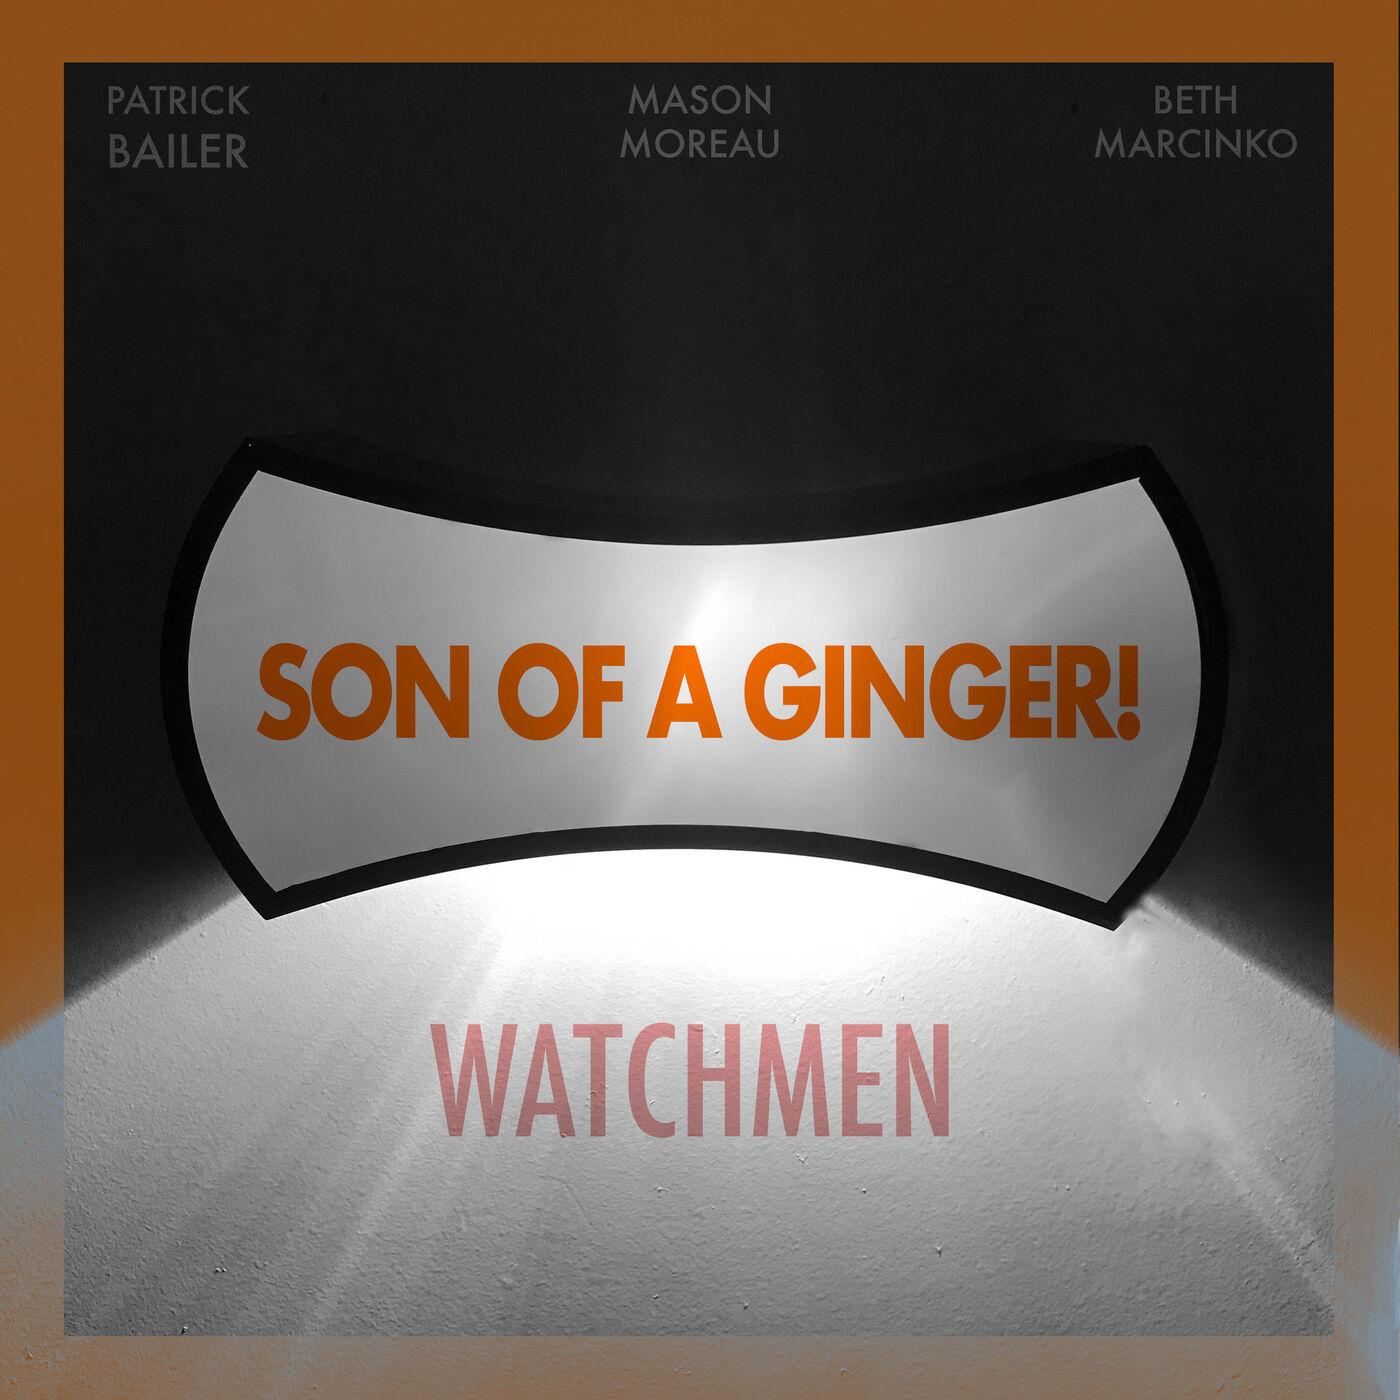 Watchmen Season 1 (Created. by Damon Lindelof)